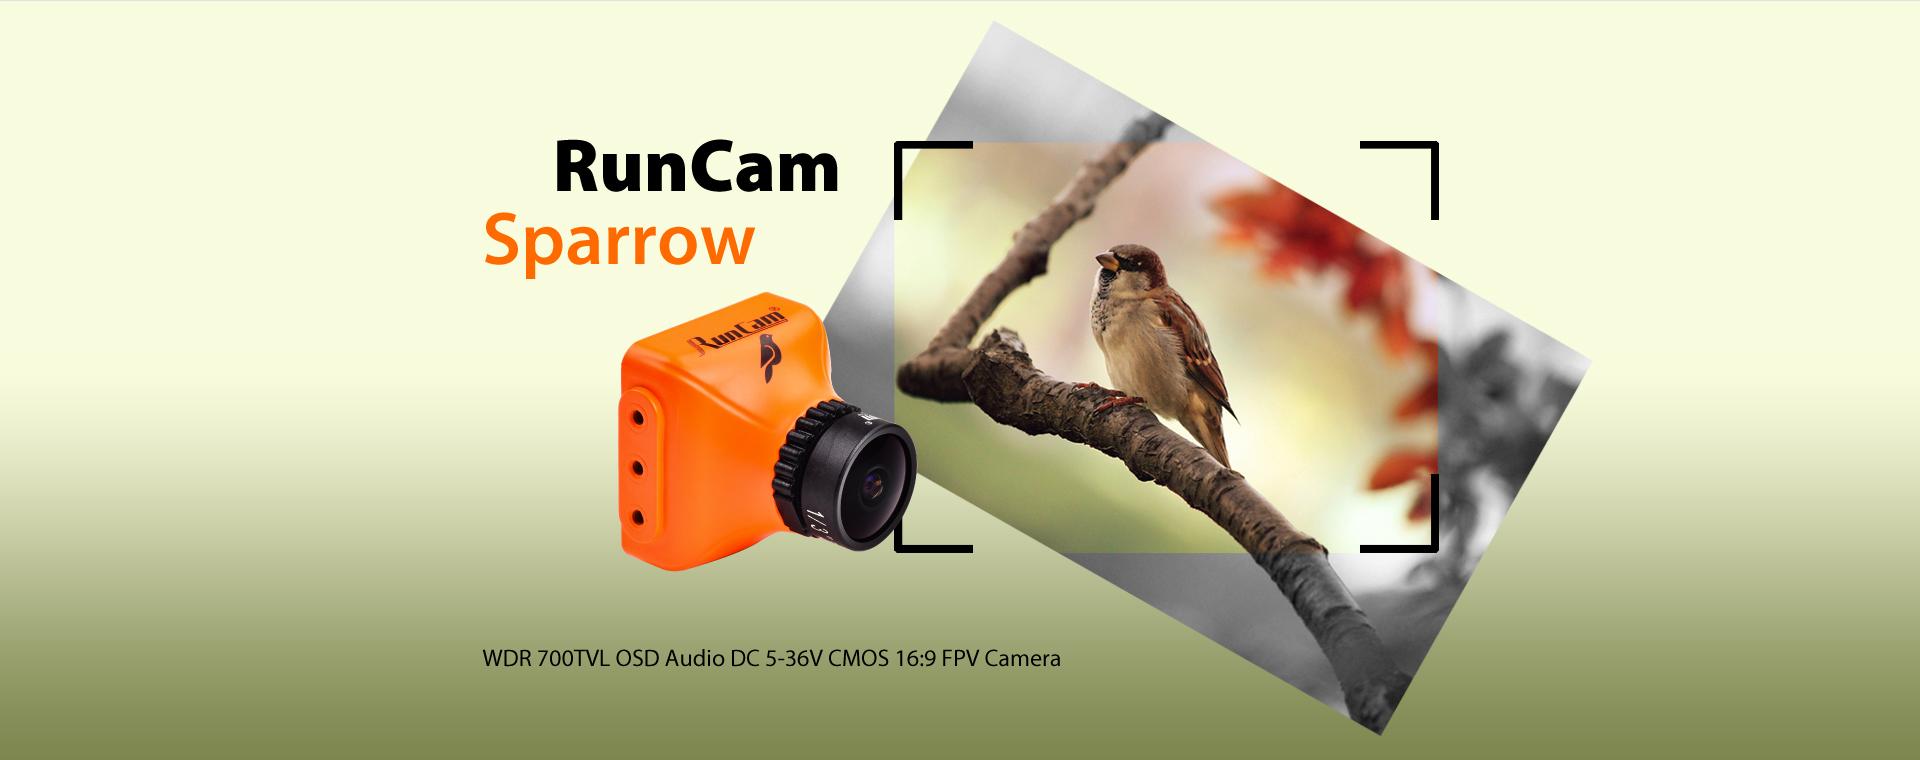 RunCam Sparrow